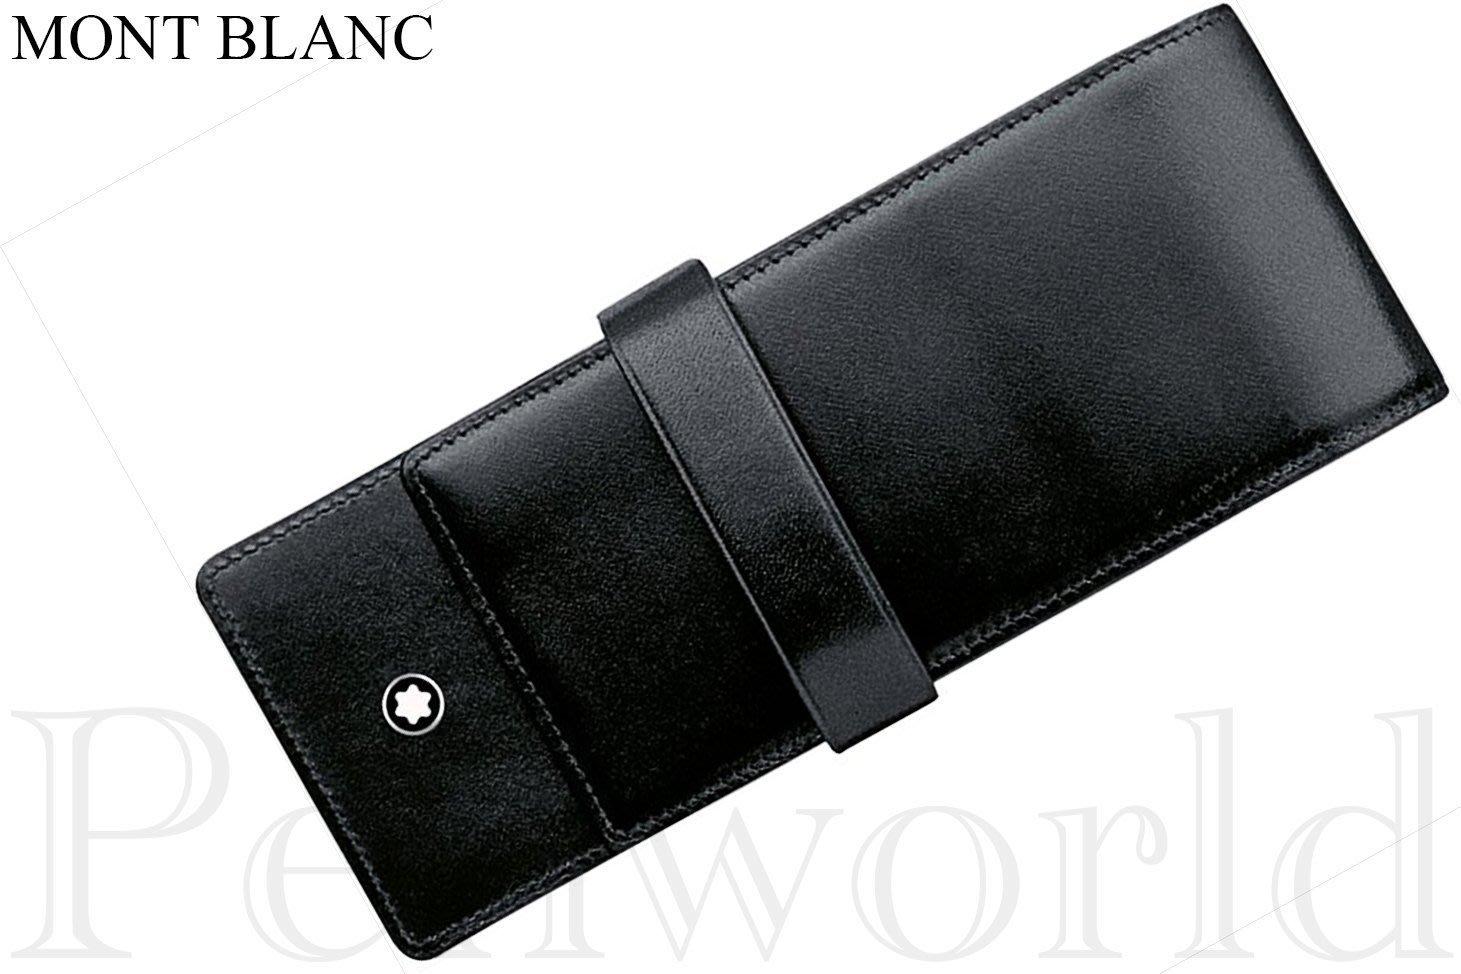 【Pen筆】Mont Blanc萬寶龍 3支入筆套黑 (14313)